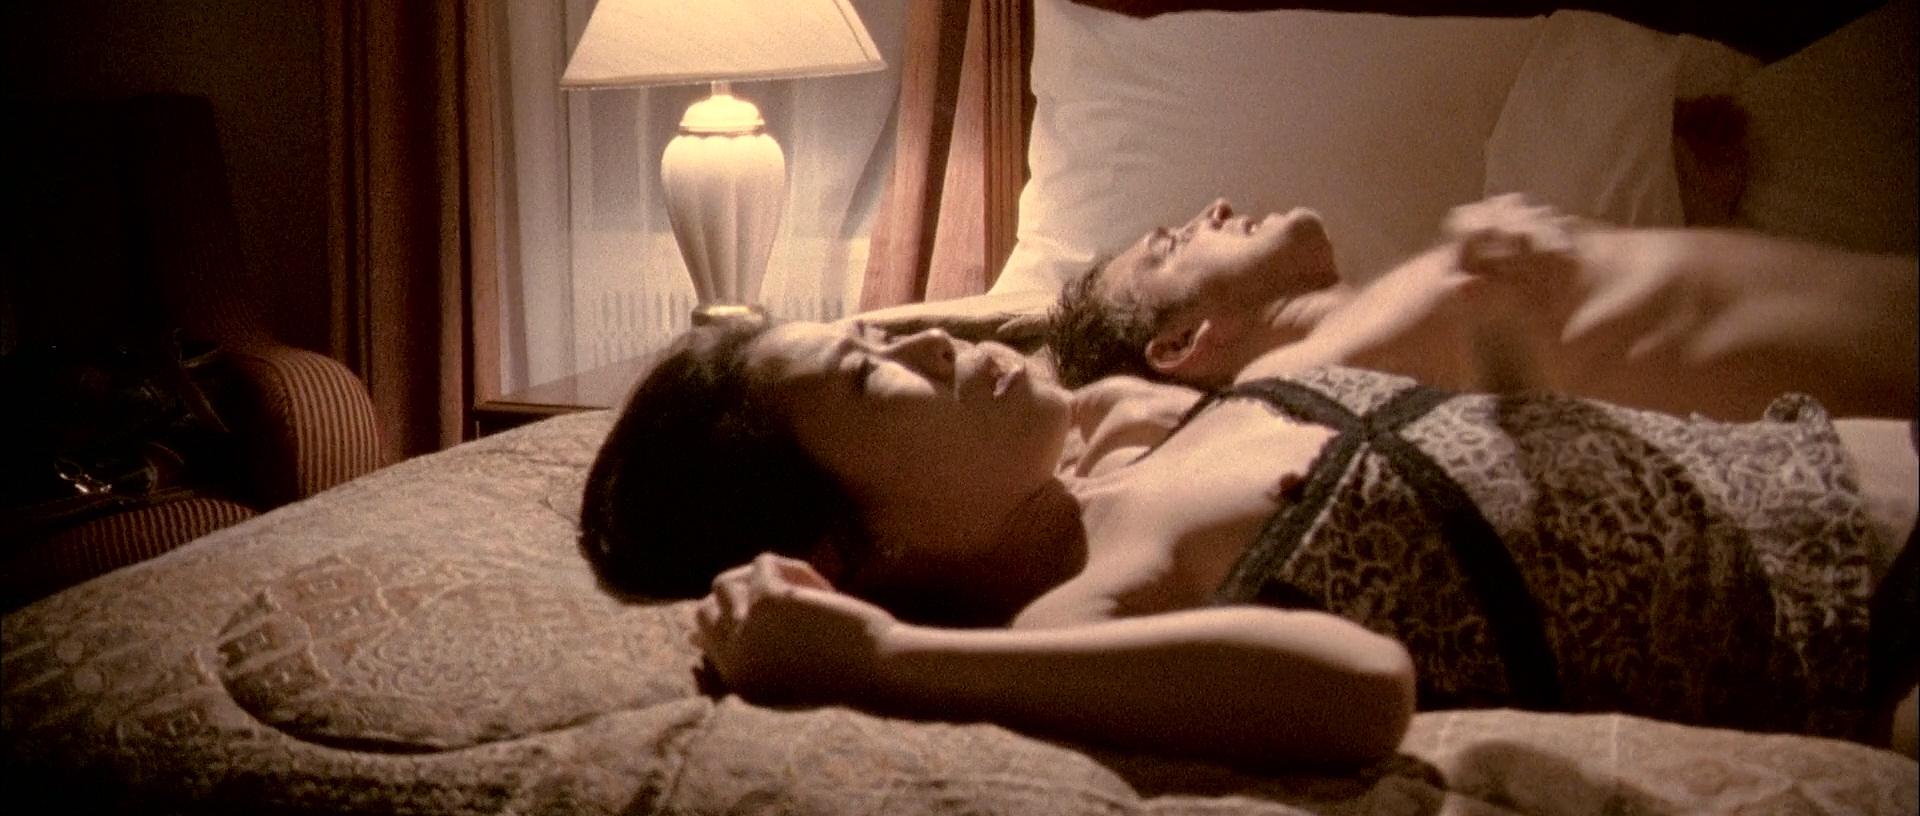 Morena Baccarin nude topless, Vanessa Kai nude sex - Death in Love (2008) hd 1080p Bluray (16)